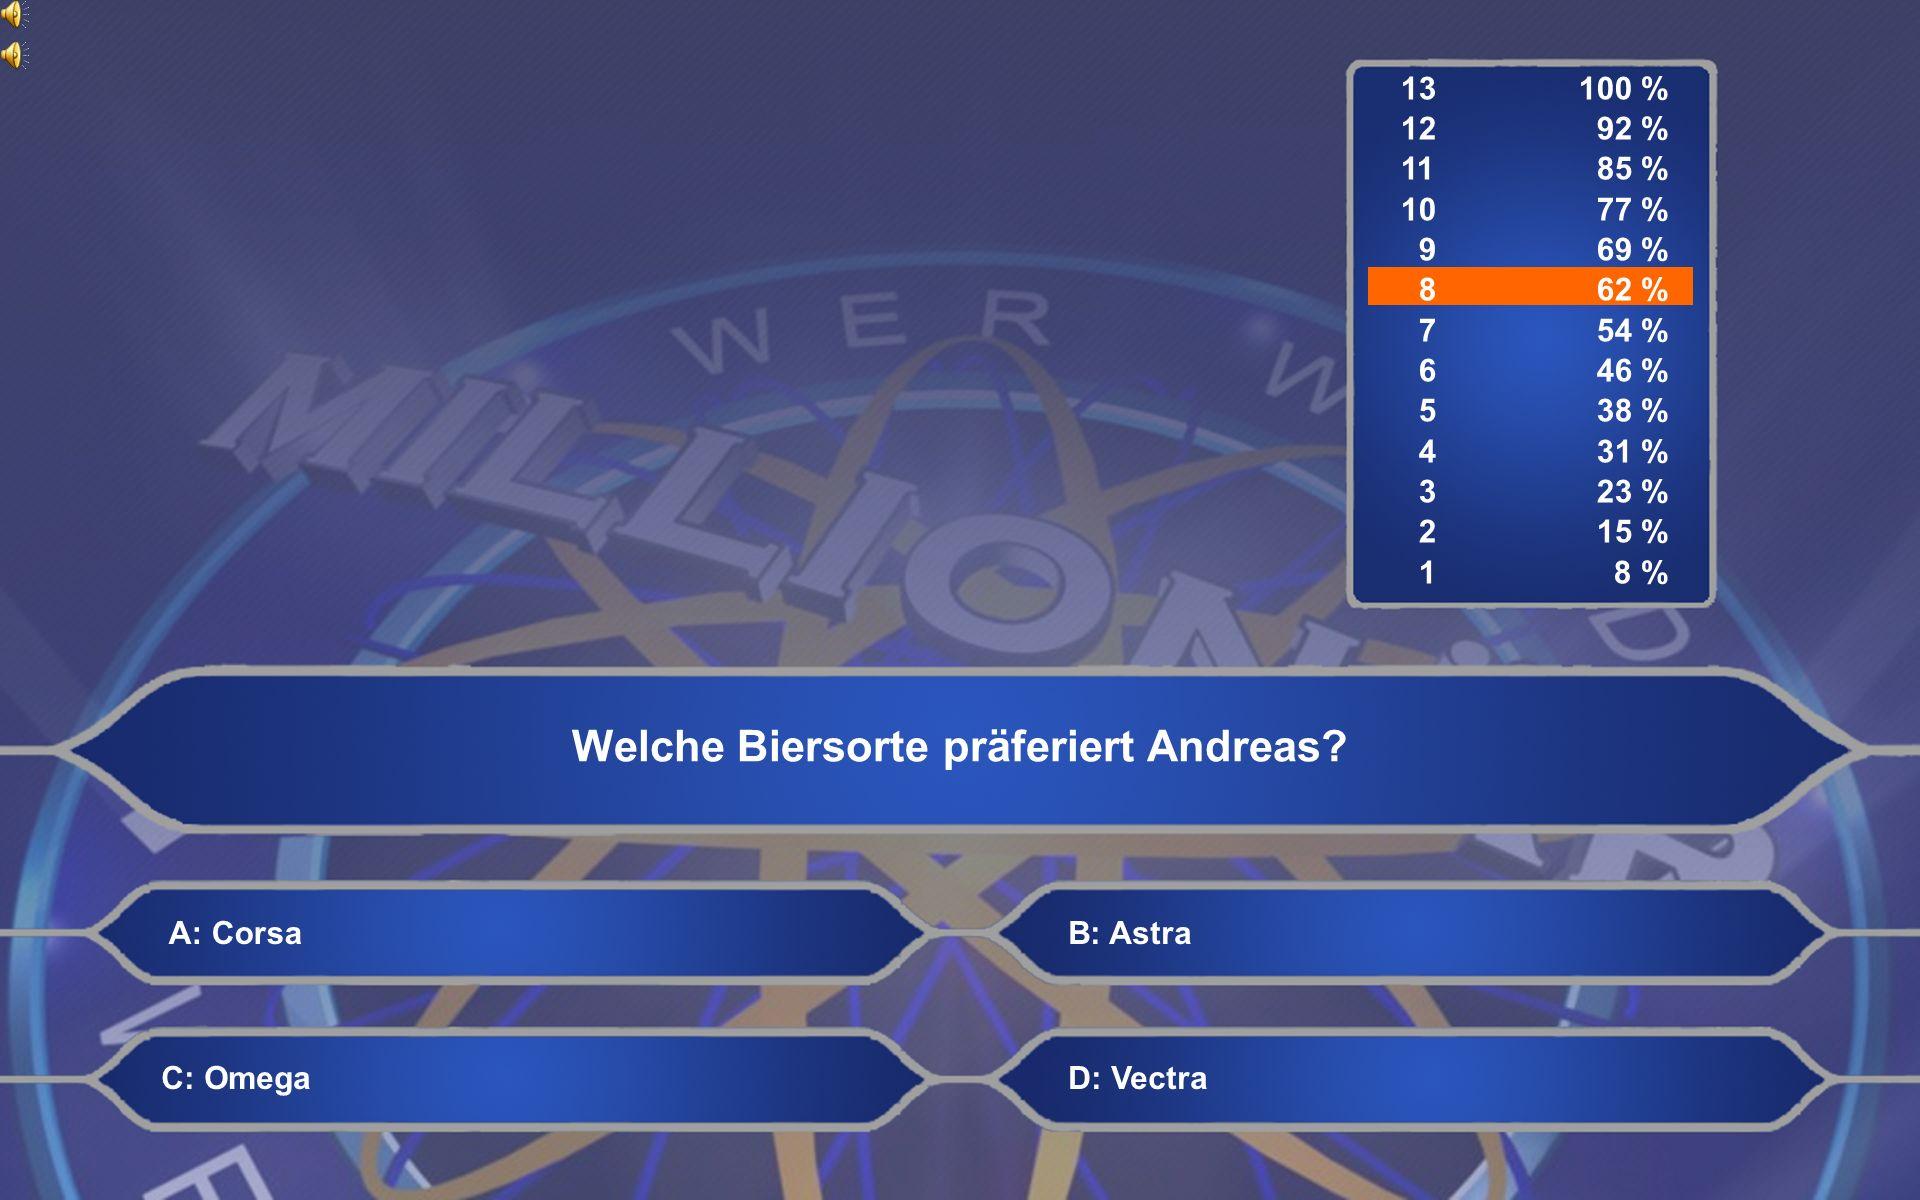 13100 % 12 92 % 11 85 % 10 77 % 9 69 % 8 62 % 7 54 % 6 46 % 5 38 % 4 31 % 3 23 % 2 15 % 1 8 % Welche Biersorte präferiert Andreas.